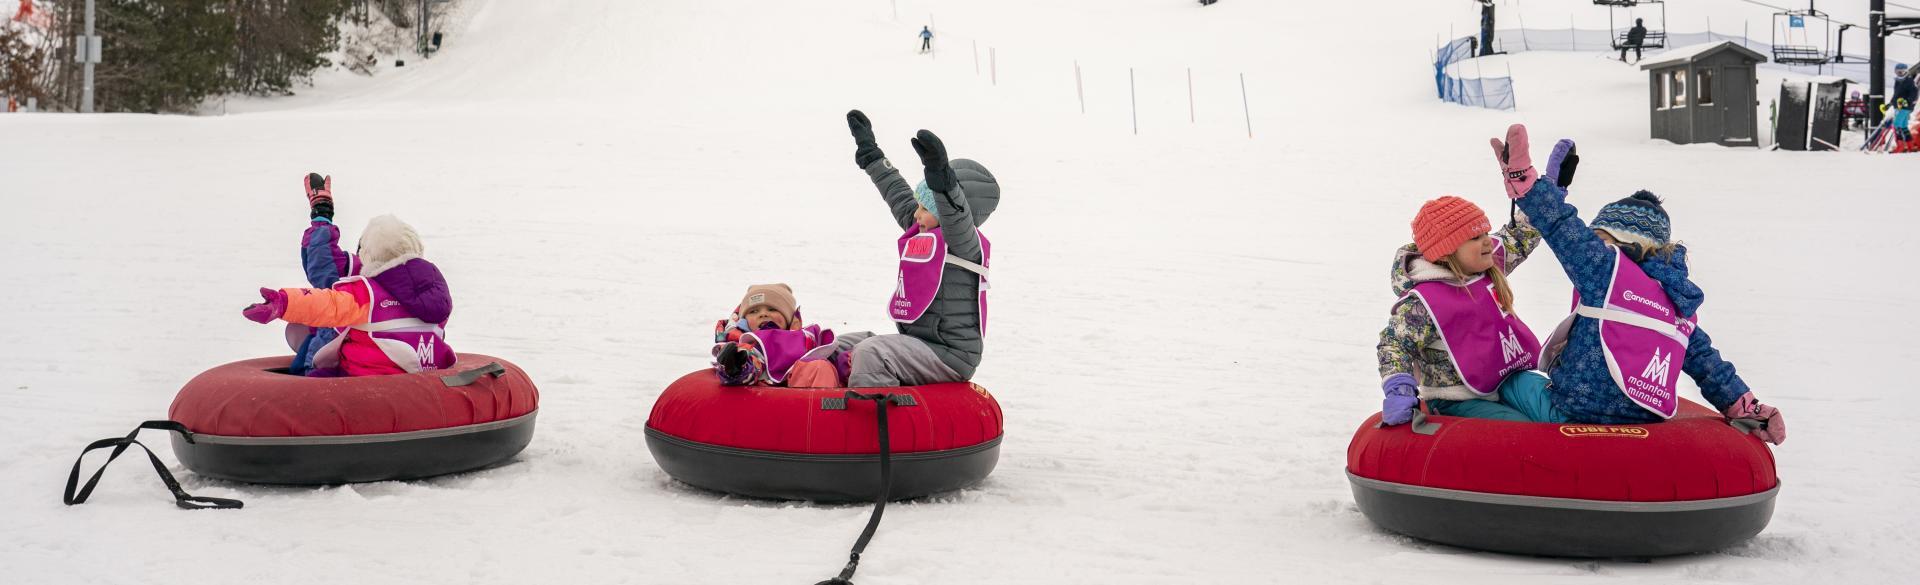 Kids tubing at Cannonsburg Ski area.